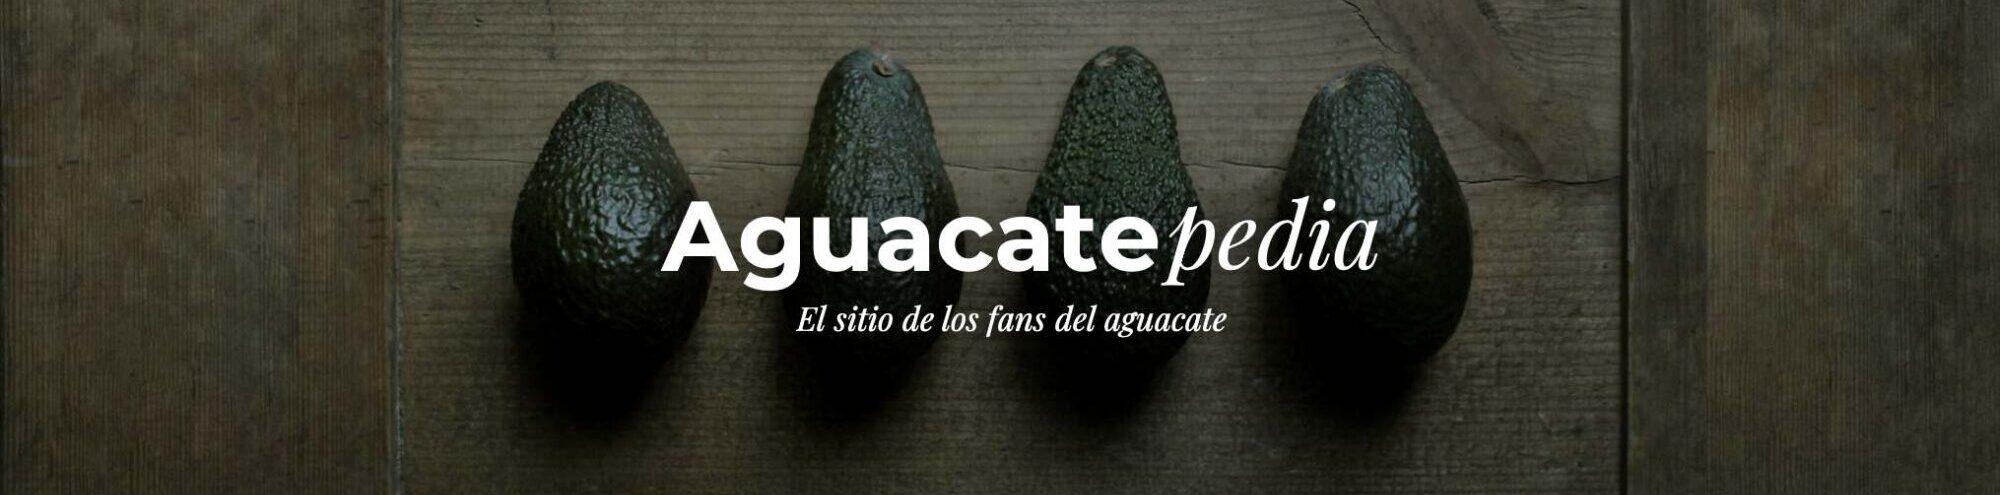 Aguacatepedia.com